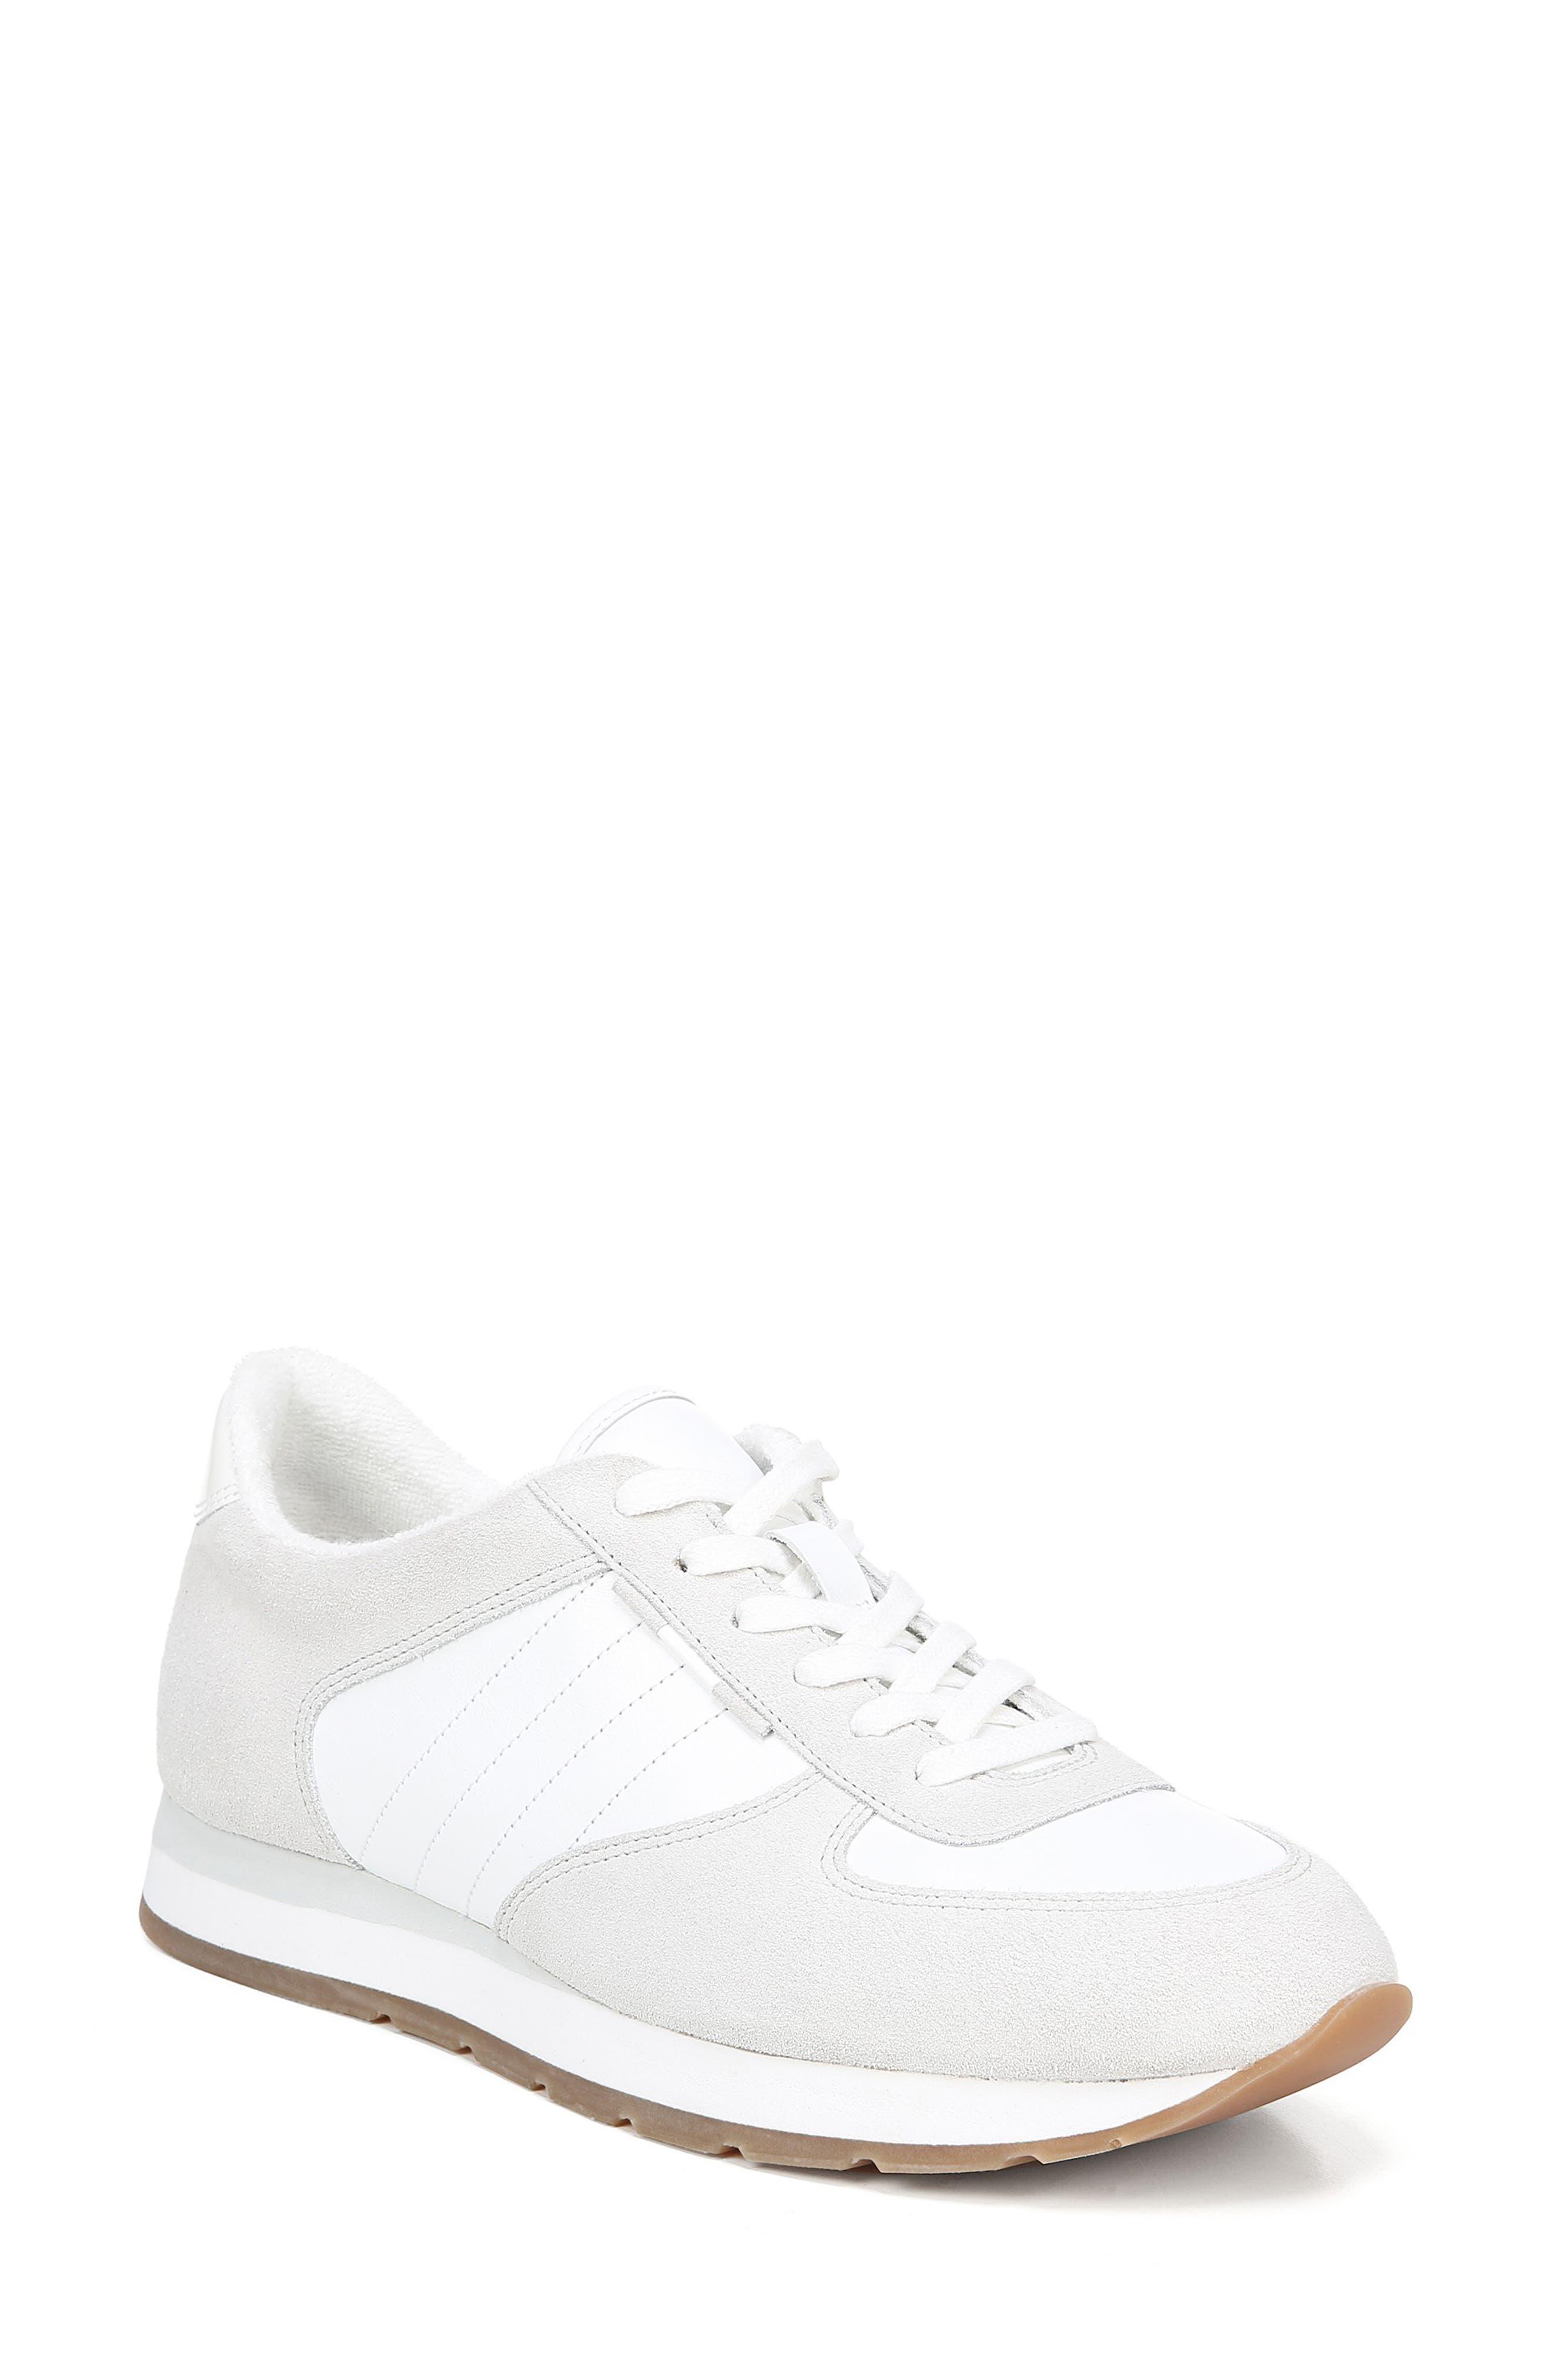 VINCE, Pasha Sneaker, Main thumbnail 1, color, WHITE